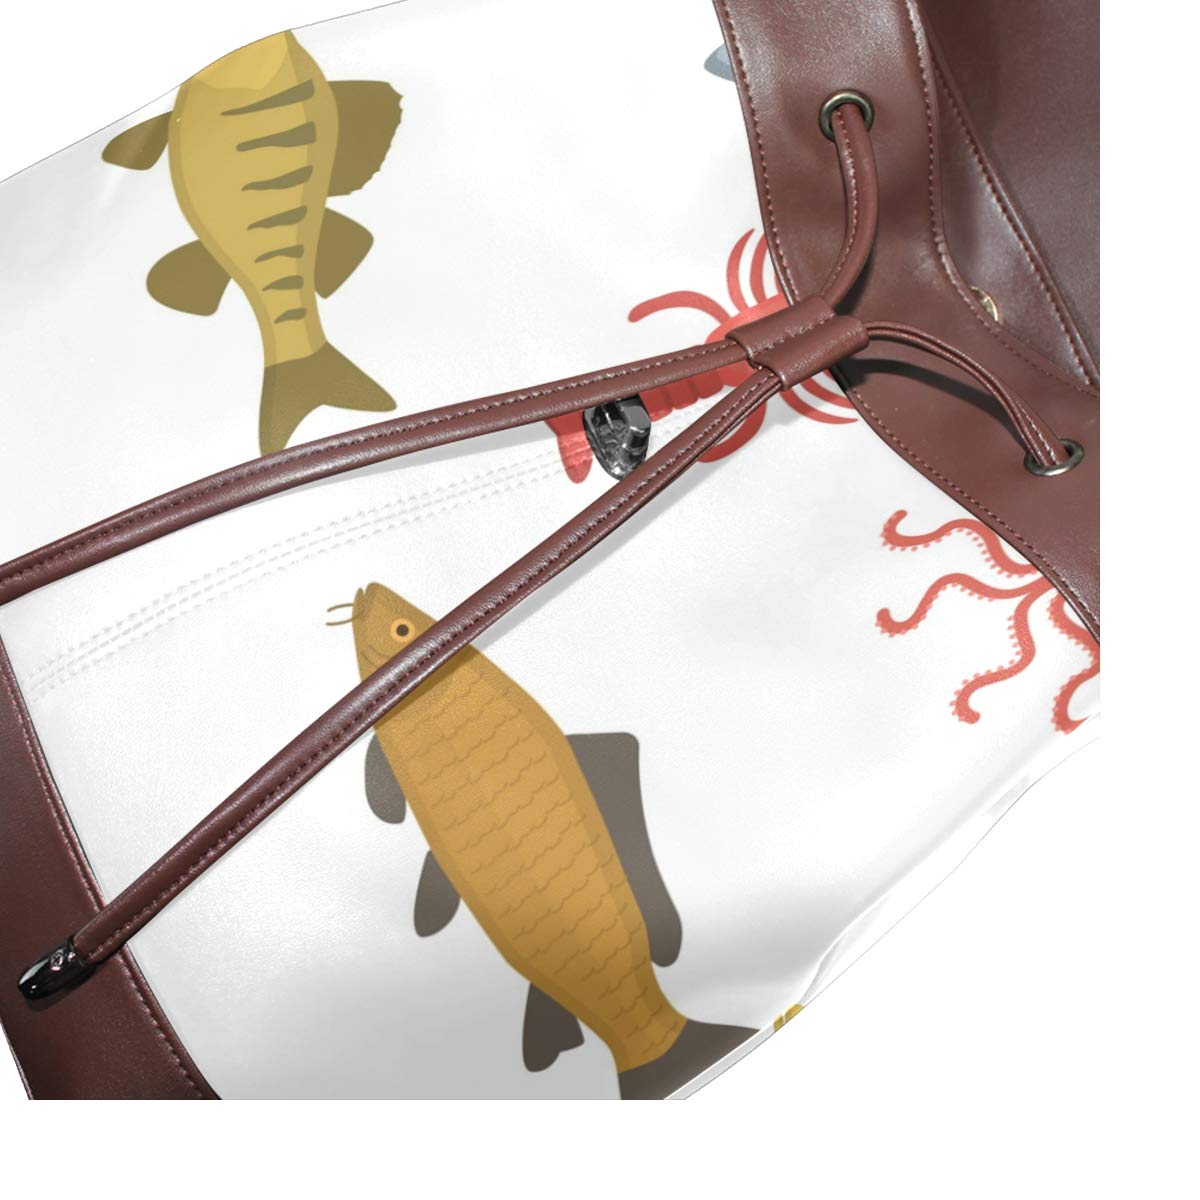 PU Leather Shoulder Bag,Flat Seafood Backpack,Portable Travel School Rucksack,Satchel with Top Handle